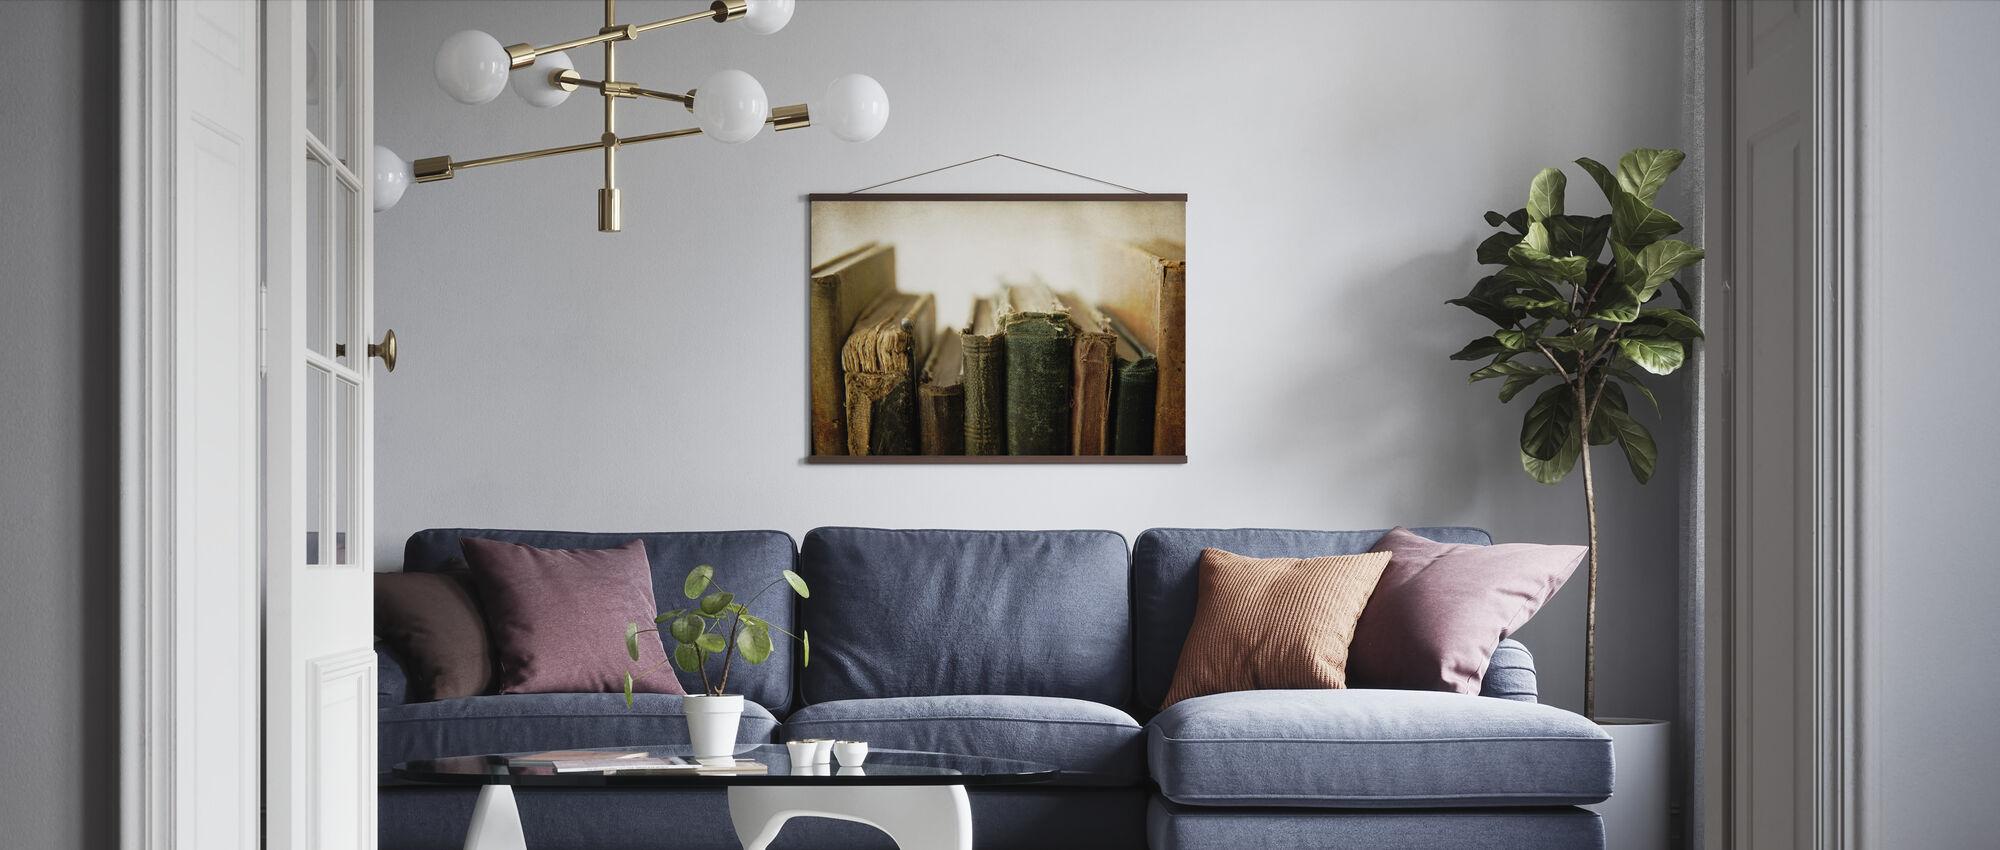 Back of Old Books - Poster - Living Room